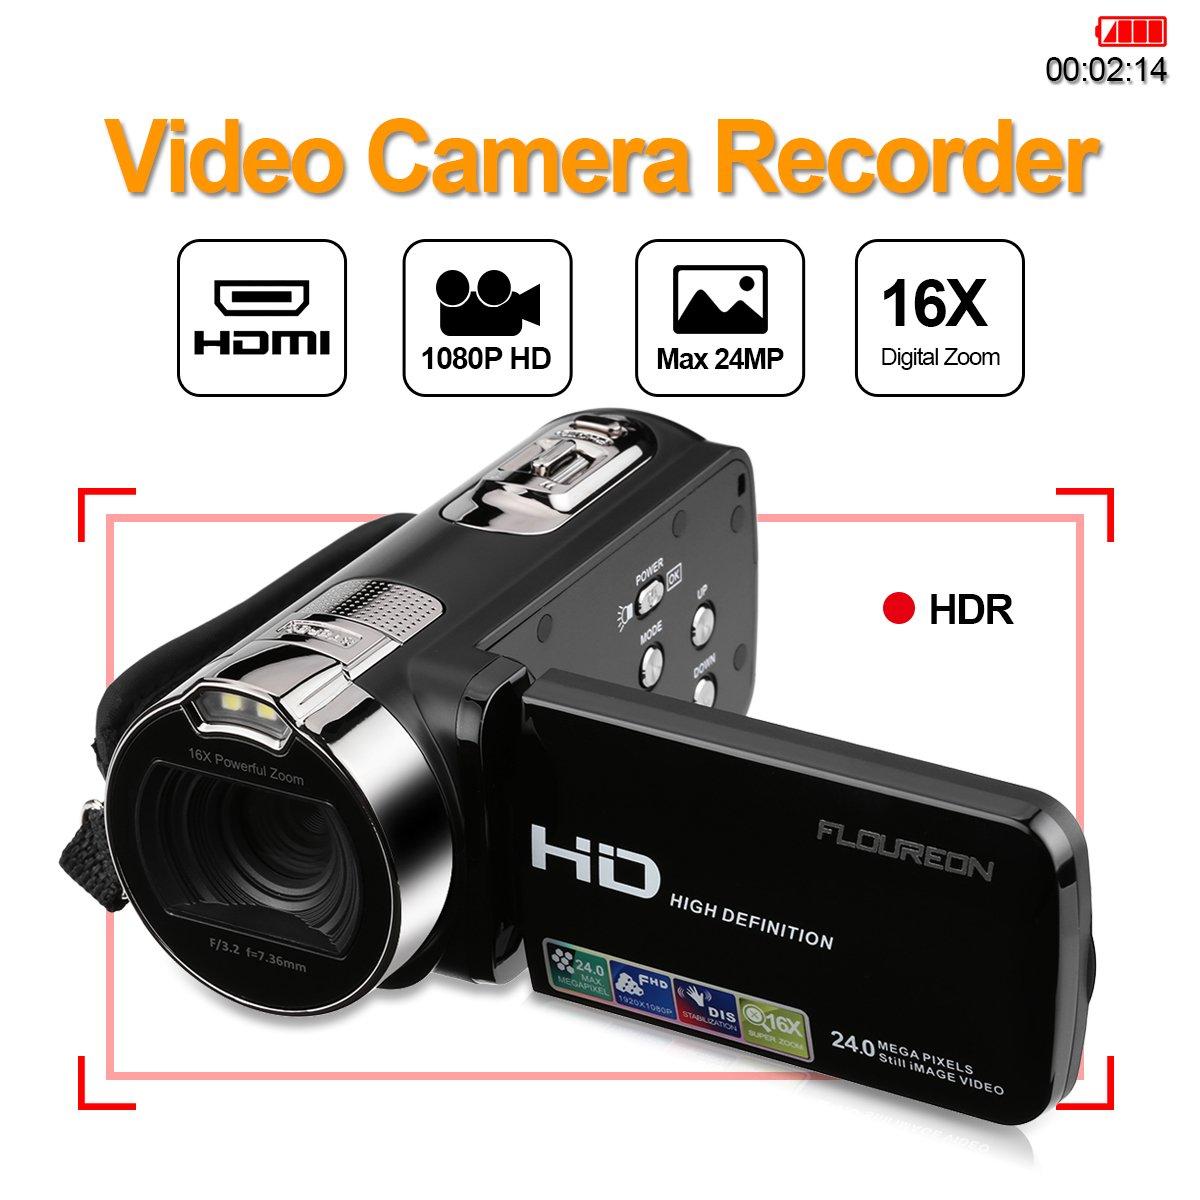 FLOUREON 1080P Full HD Portable Camcorder Digital Video Camera DV 2.7 TFT LCD Screen 16x Zoom 270 Degrees Rotation for Sport /Youtube/Short Films Video Recording (1080P DV Camcorder, BLACK) MQ17CFMO